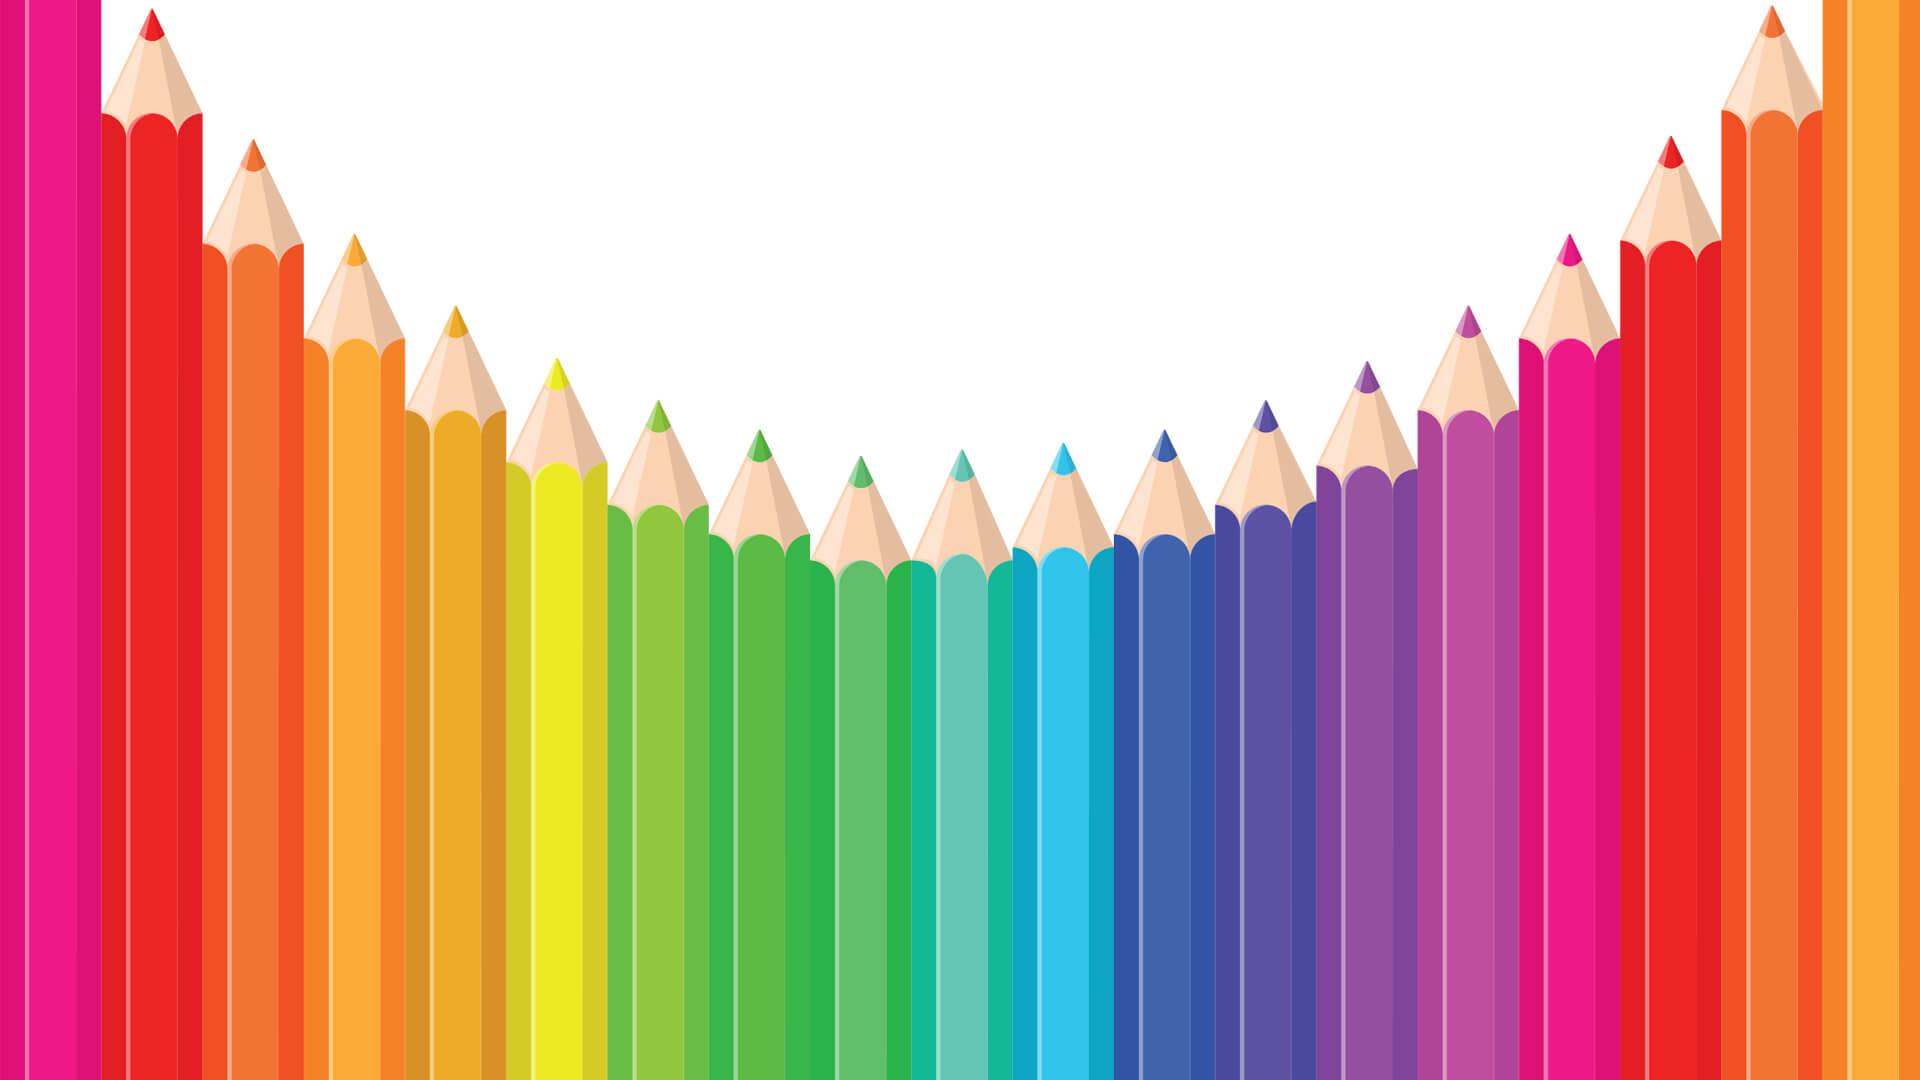 Addressing Gender Diversity in the School Setting